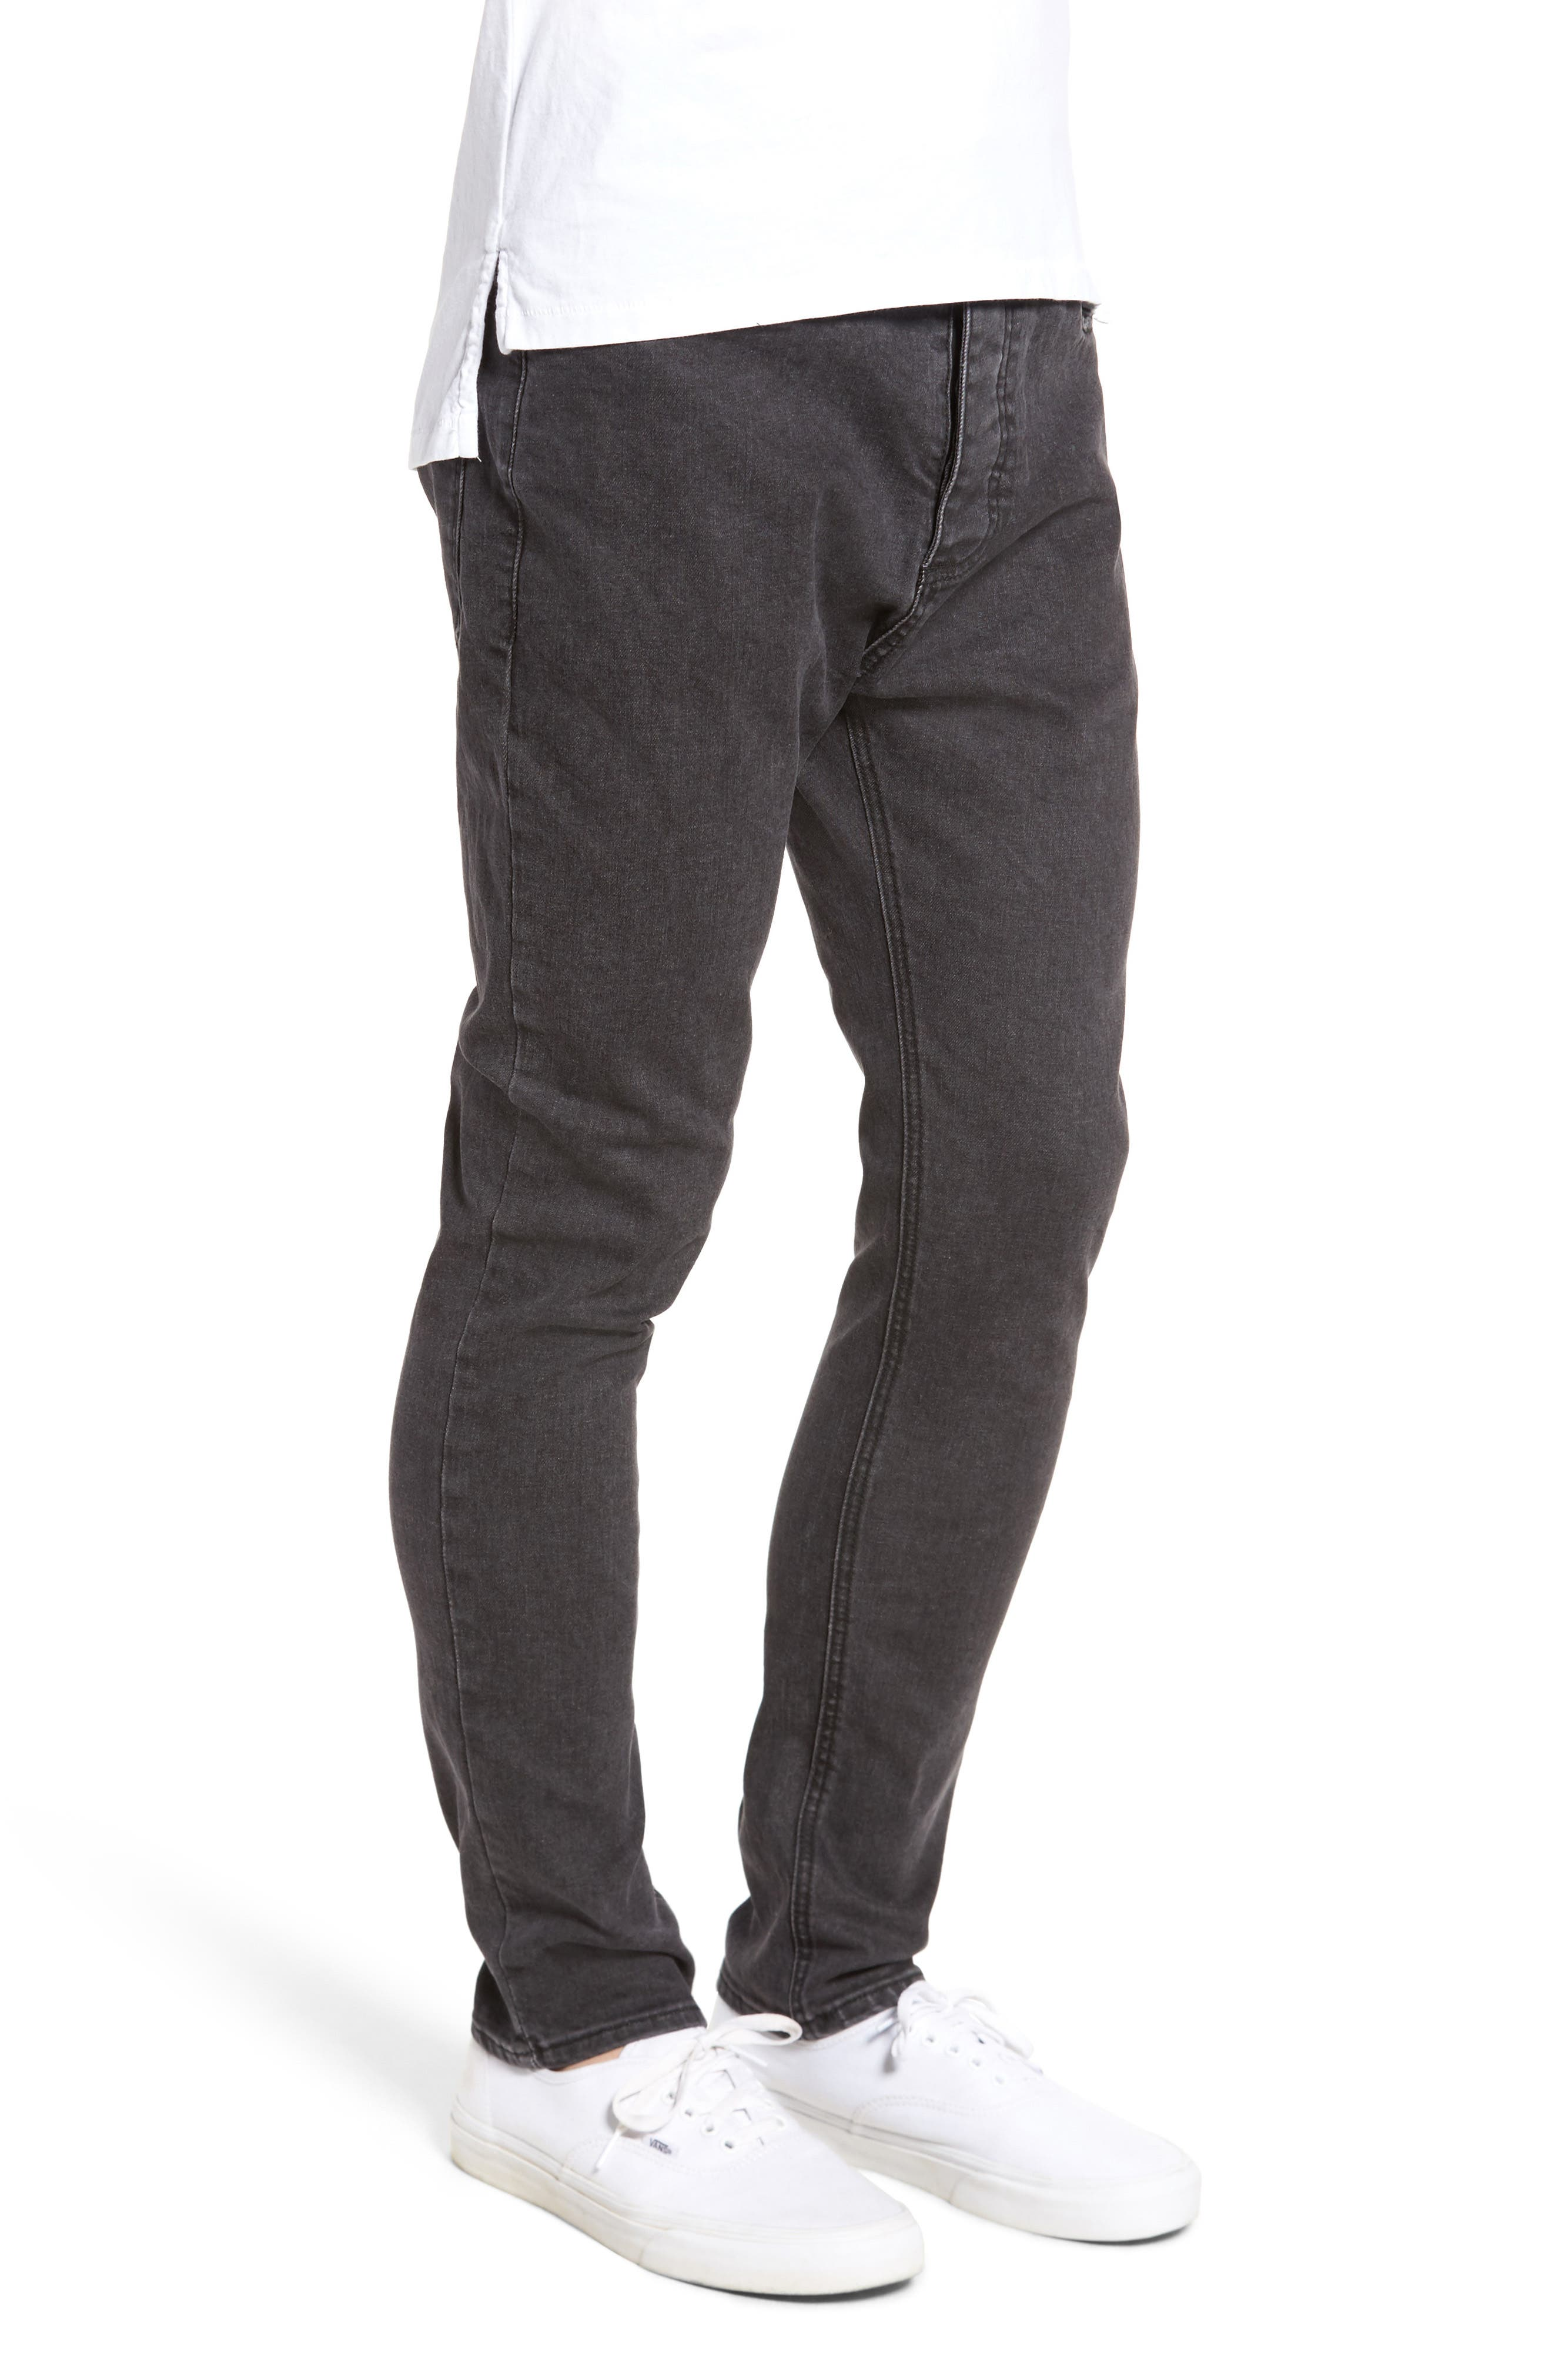 Joe Blow Destroyed Denim Jeans,                             Alternate thumbnail 3, color,                             BLACK